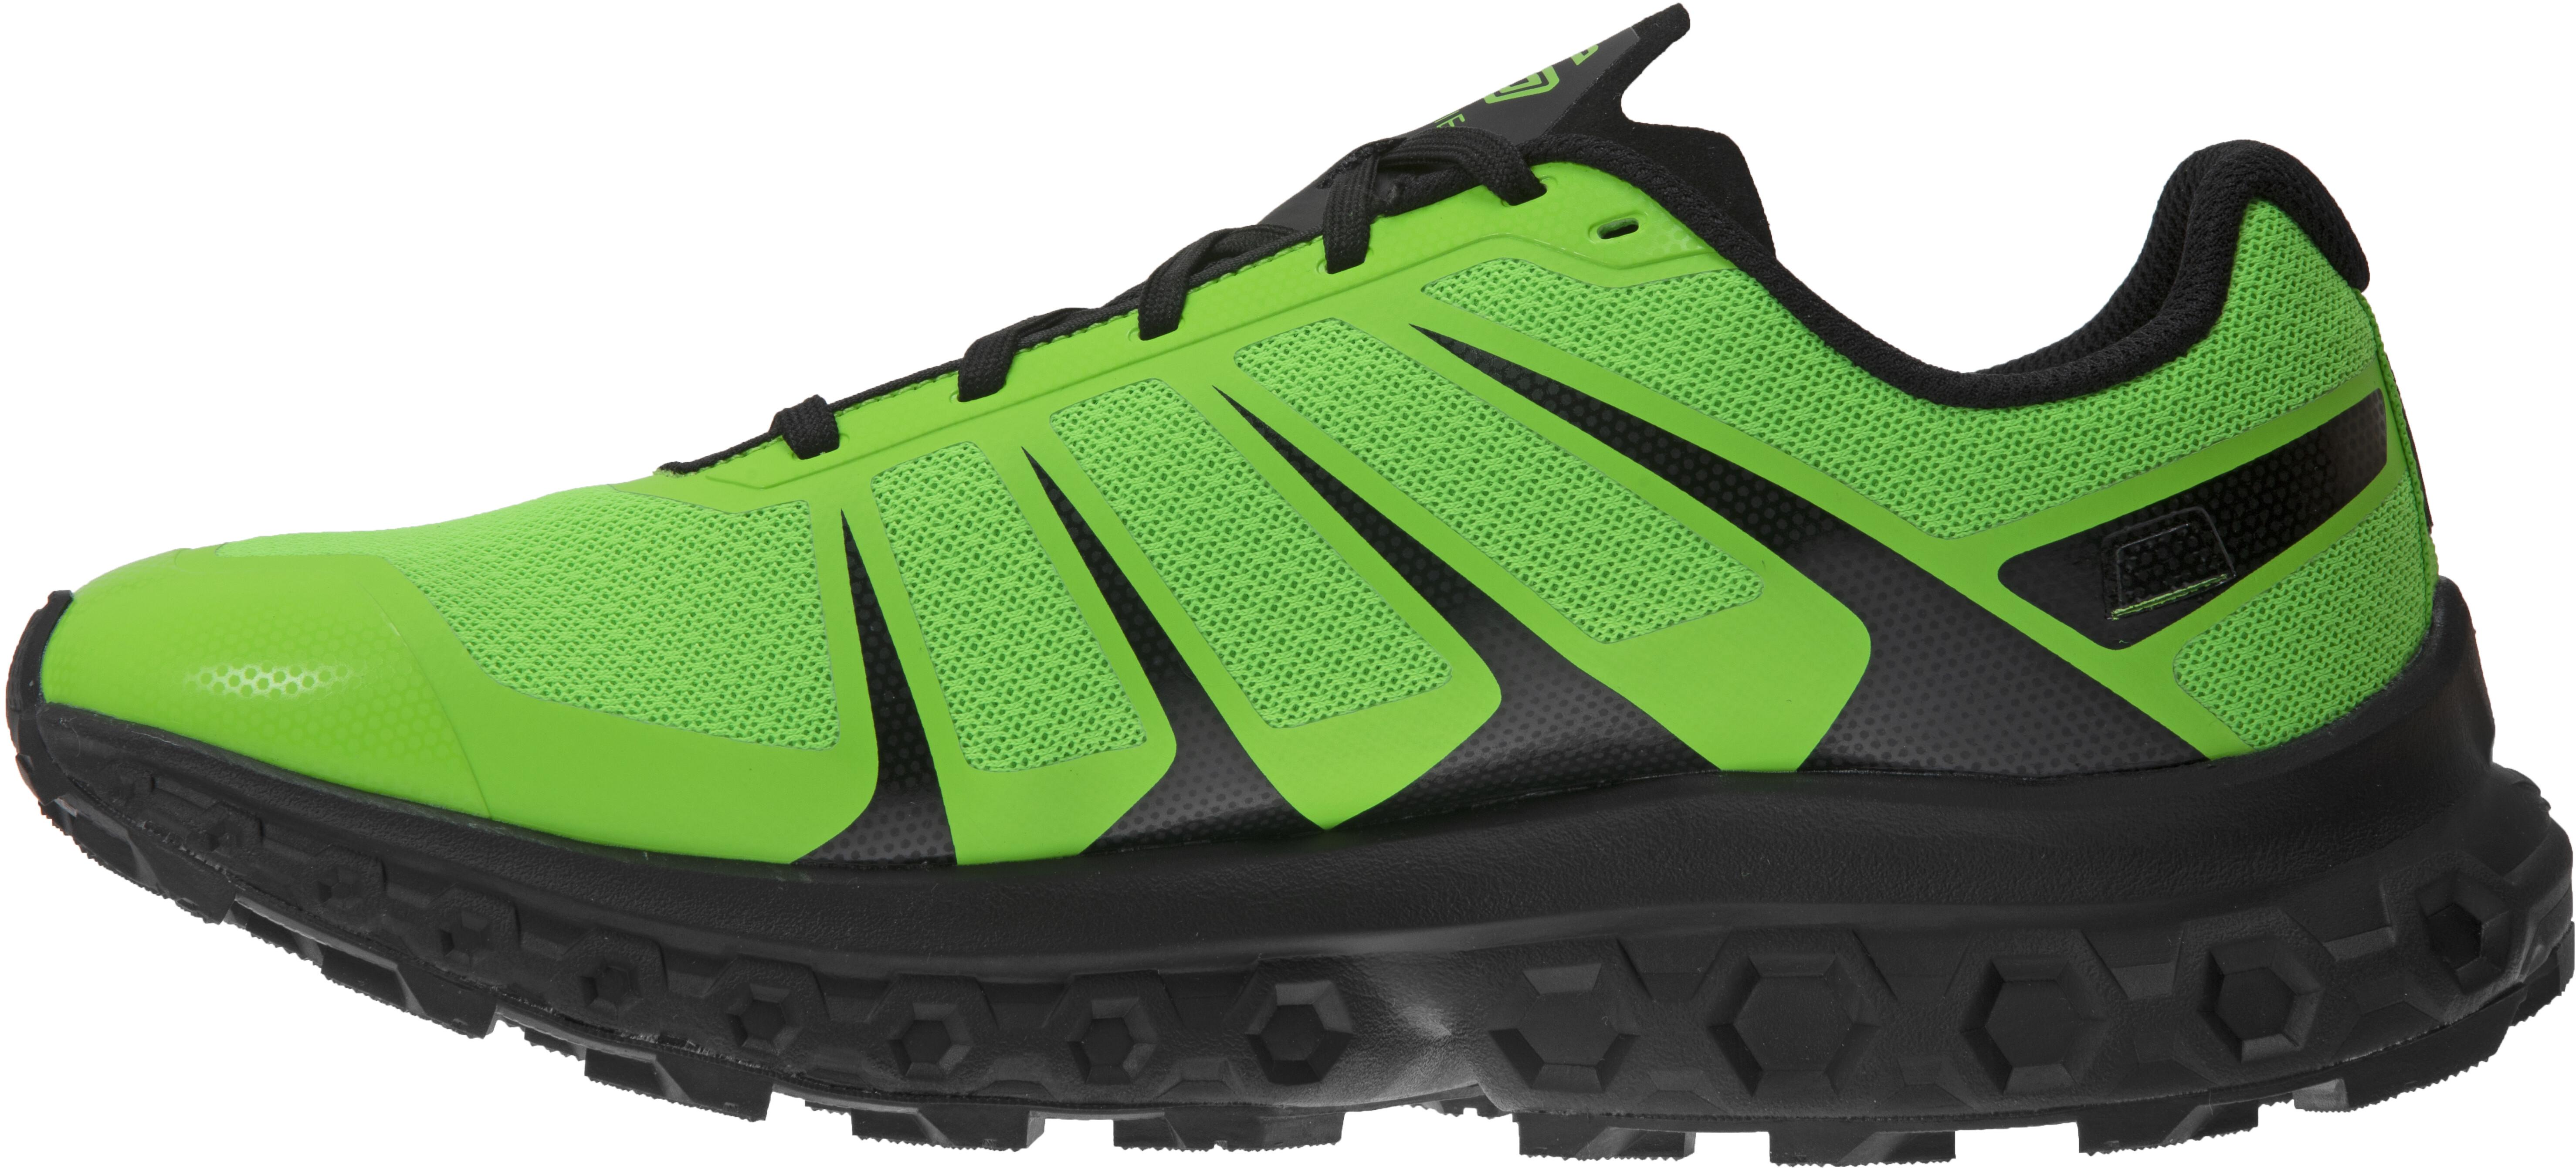 Green Inov8 TrailFly Ultra G 300 Max Mens Trail Running Shoes